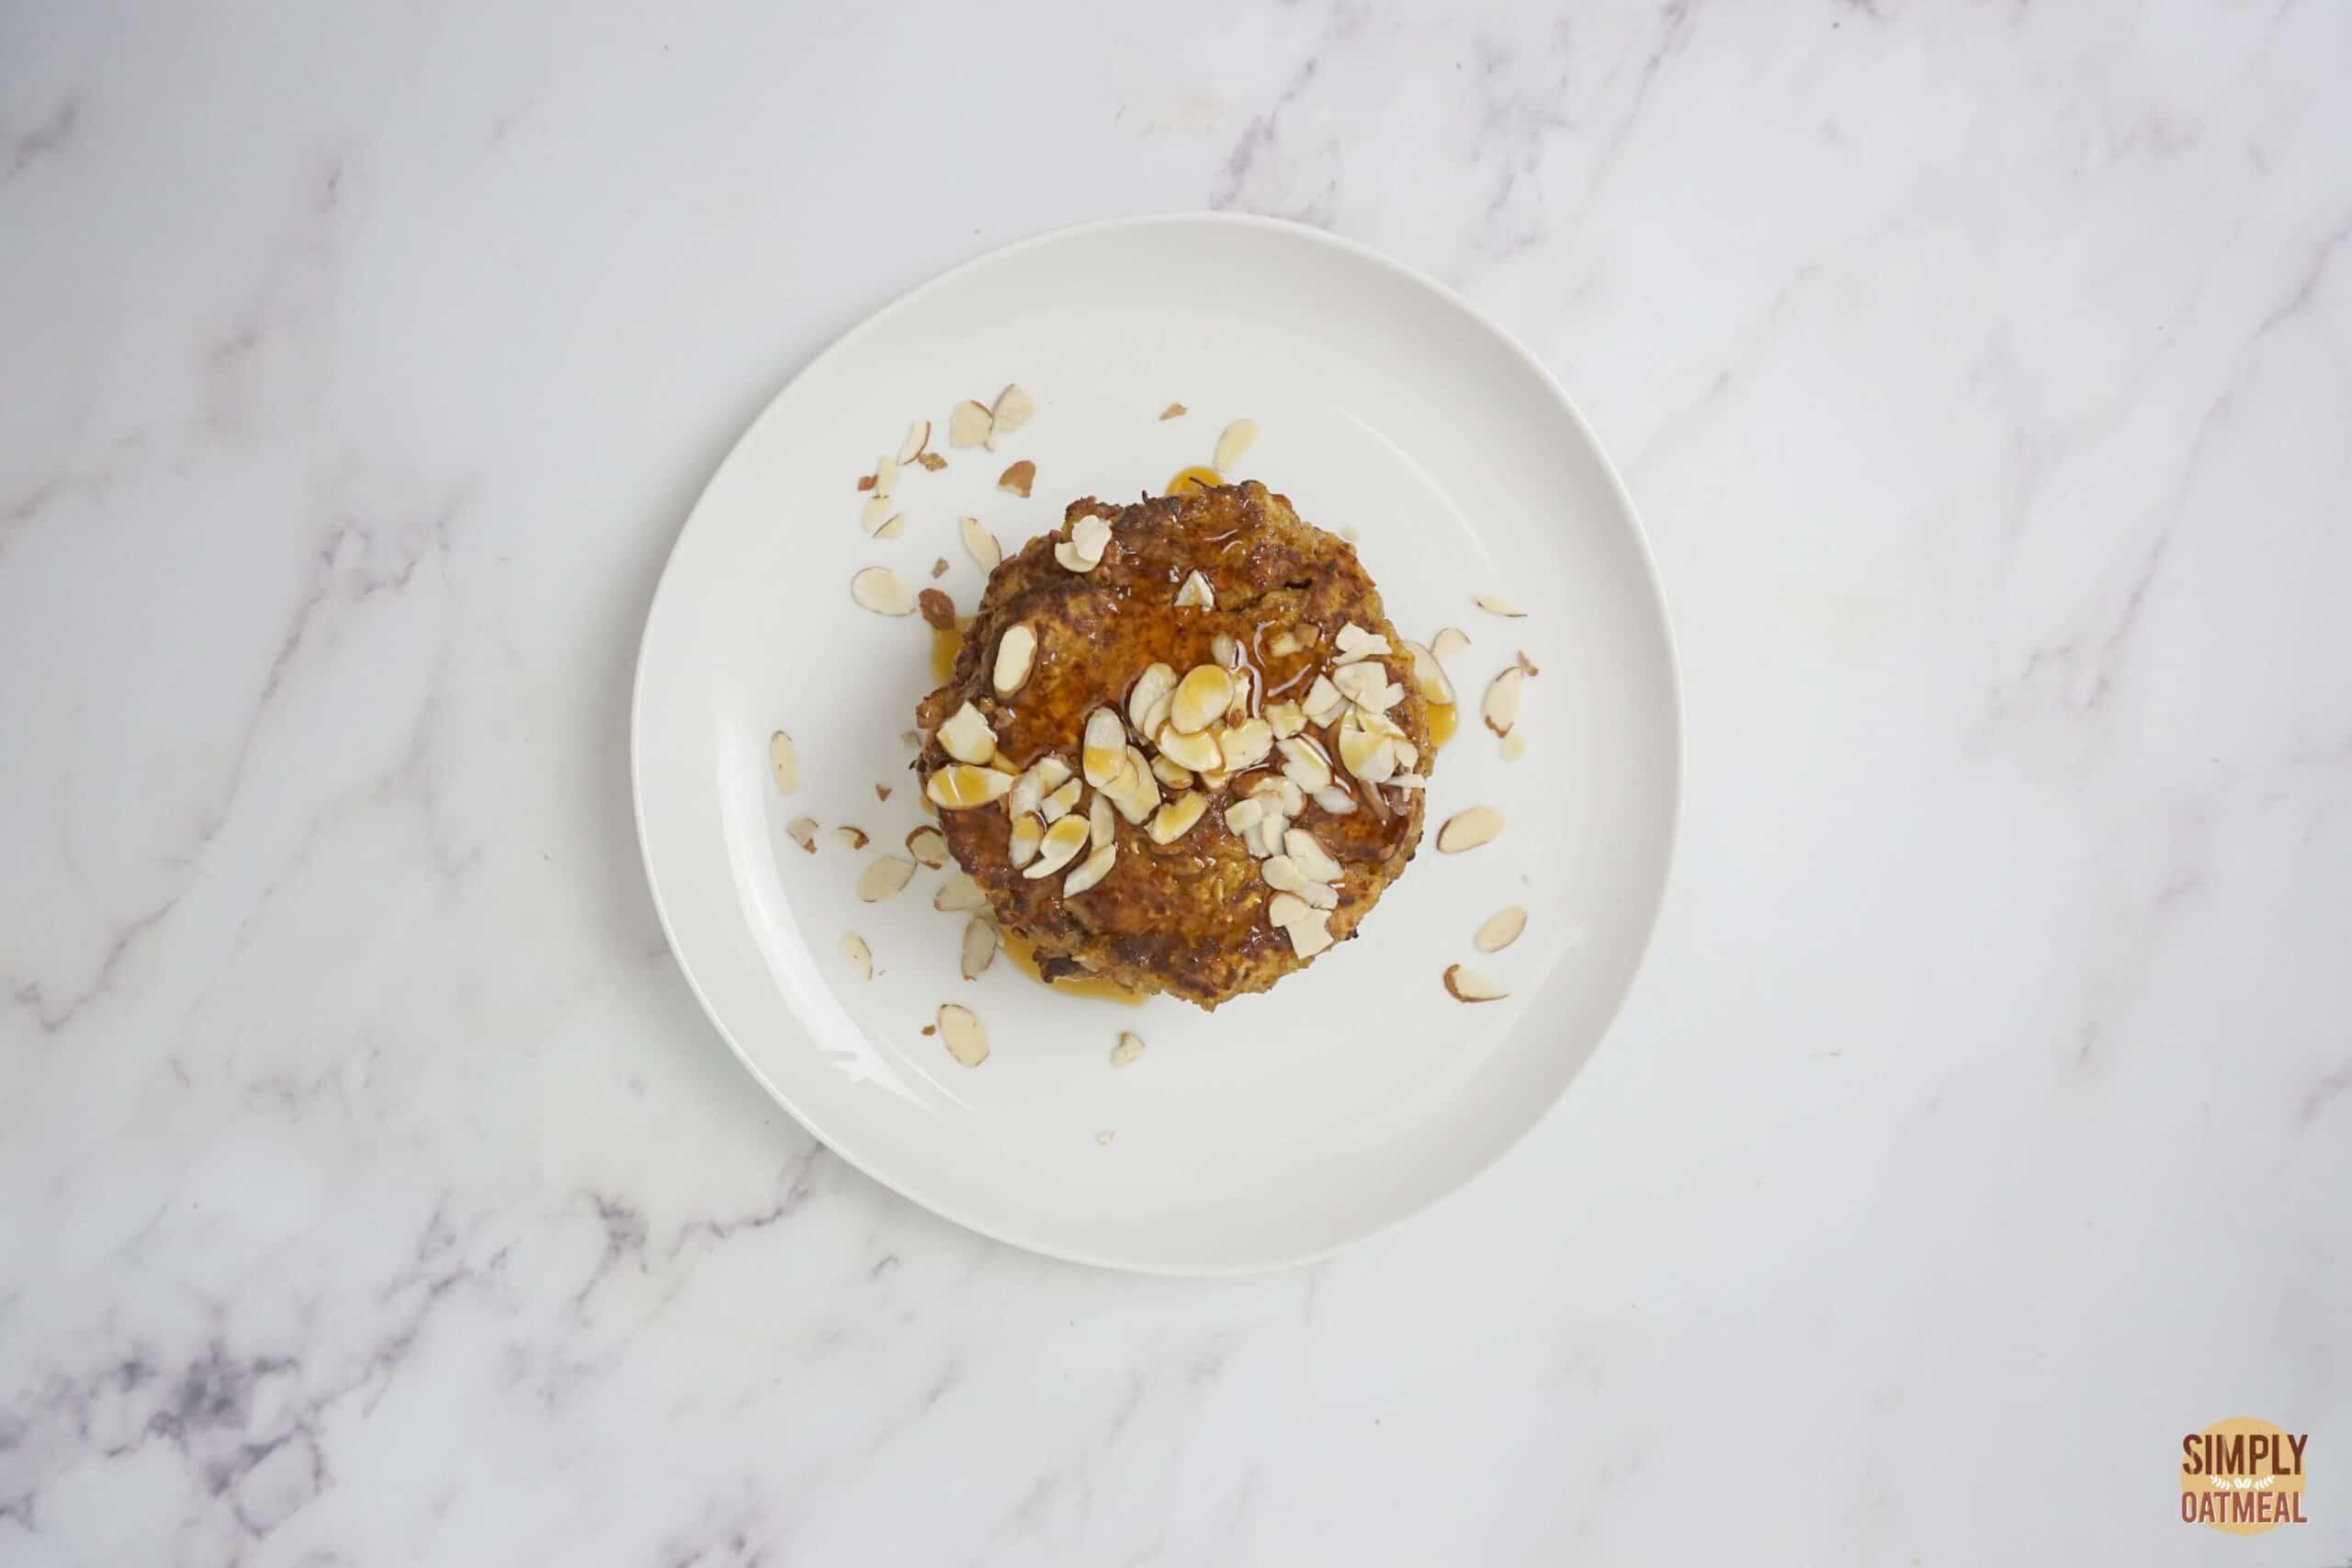 Sweet potato oatmeal pancakes on a white plate